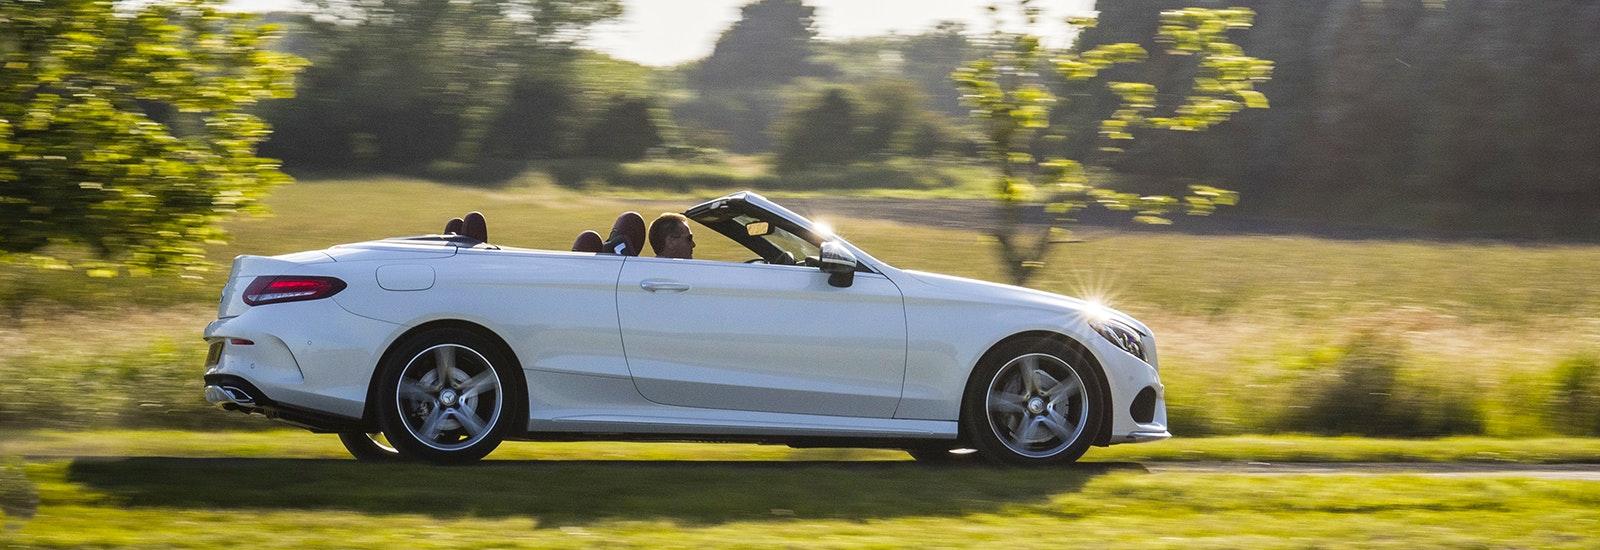 Mercedes Diesel Scrappage Scheme What Cars Qualify Carwow